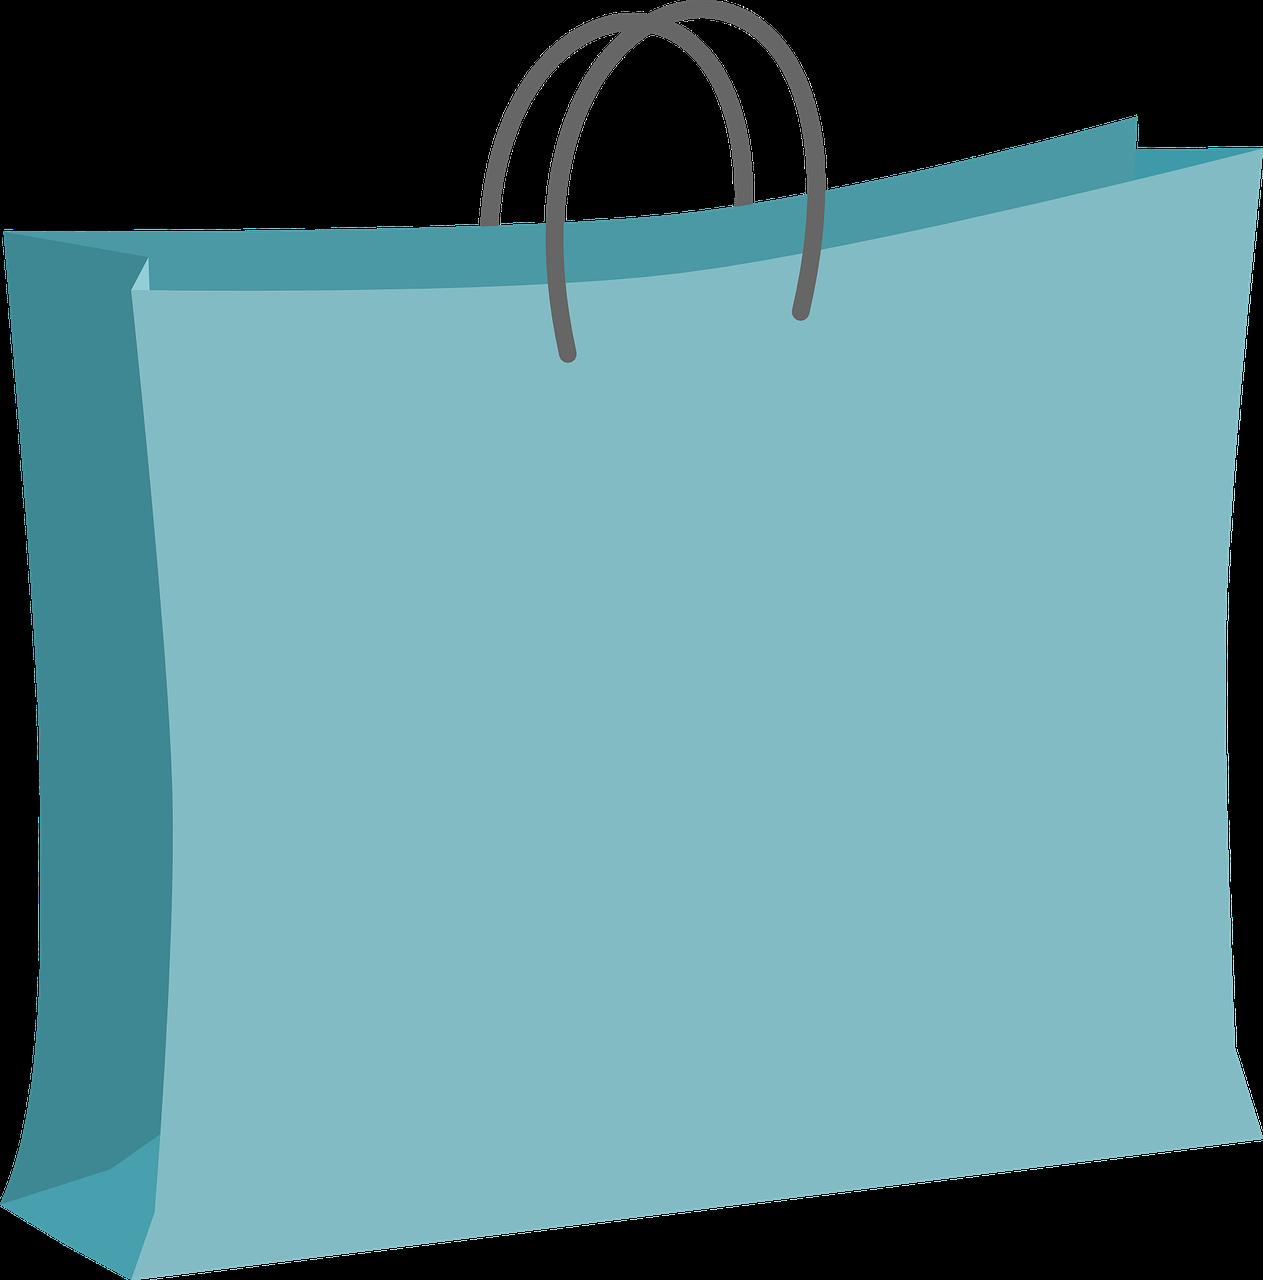 Free to Use & Public Domain Shopping Bag Clip Art.